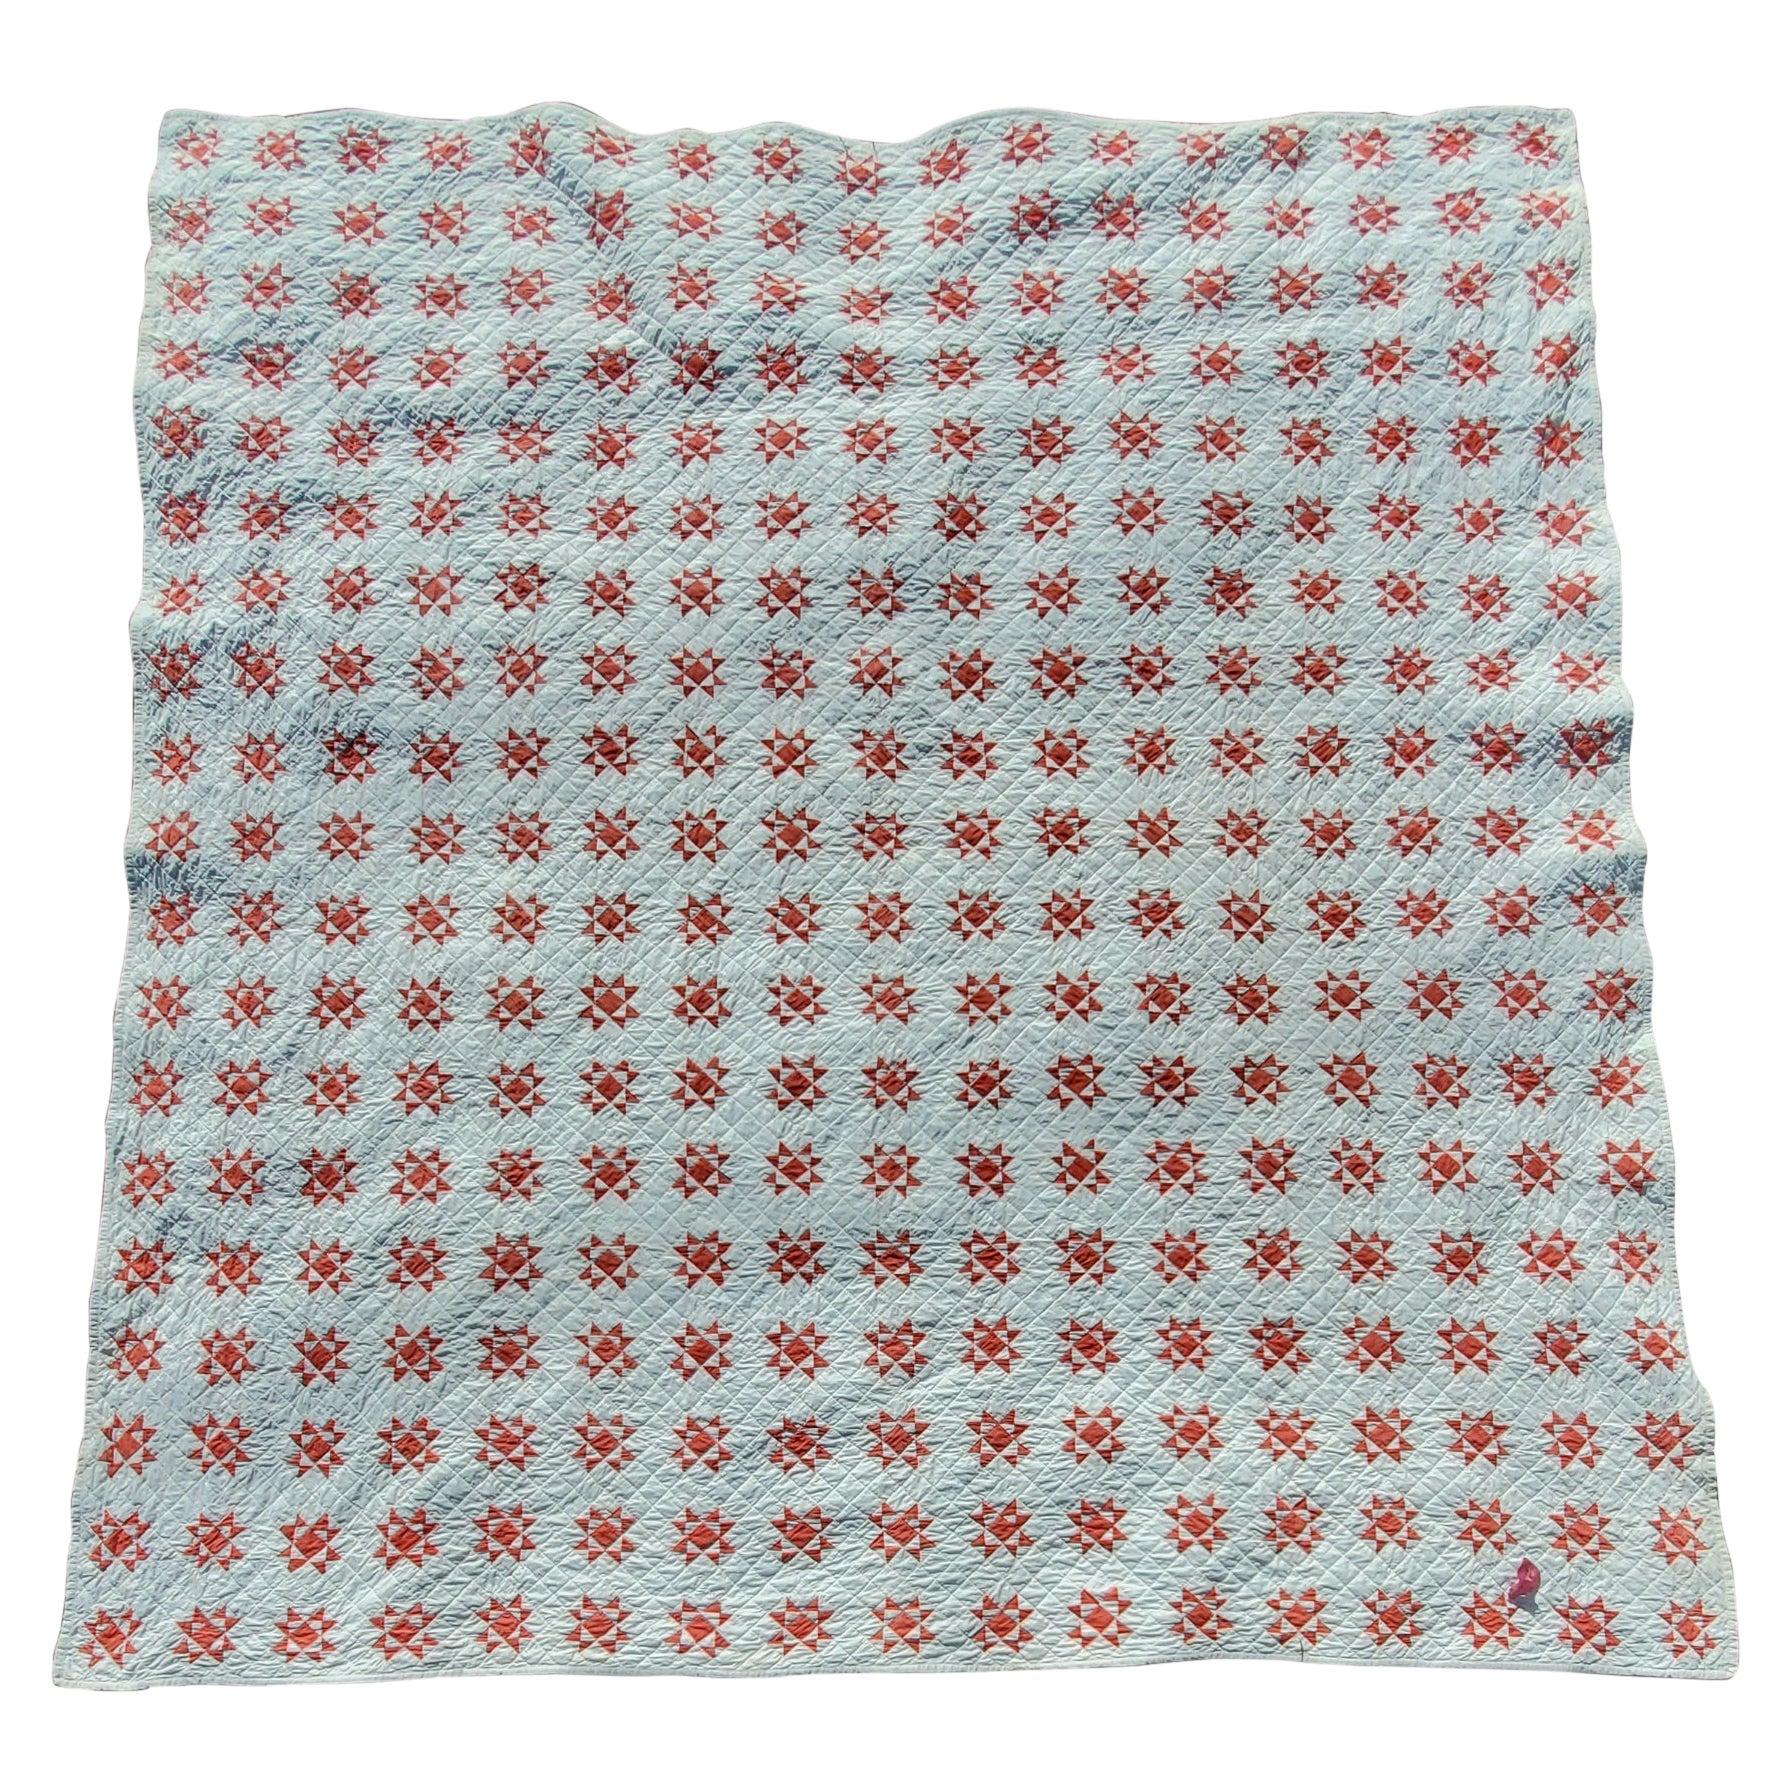 19th Century Mini Stars Red and White Quilt